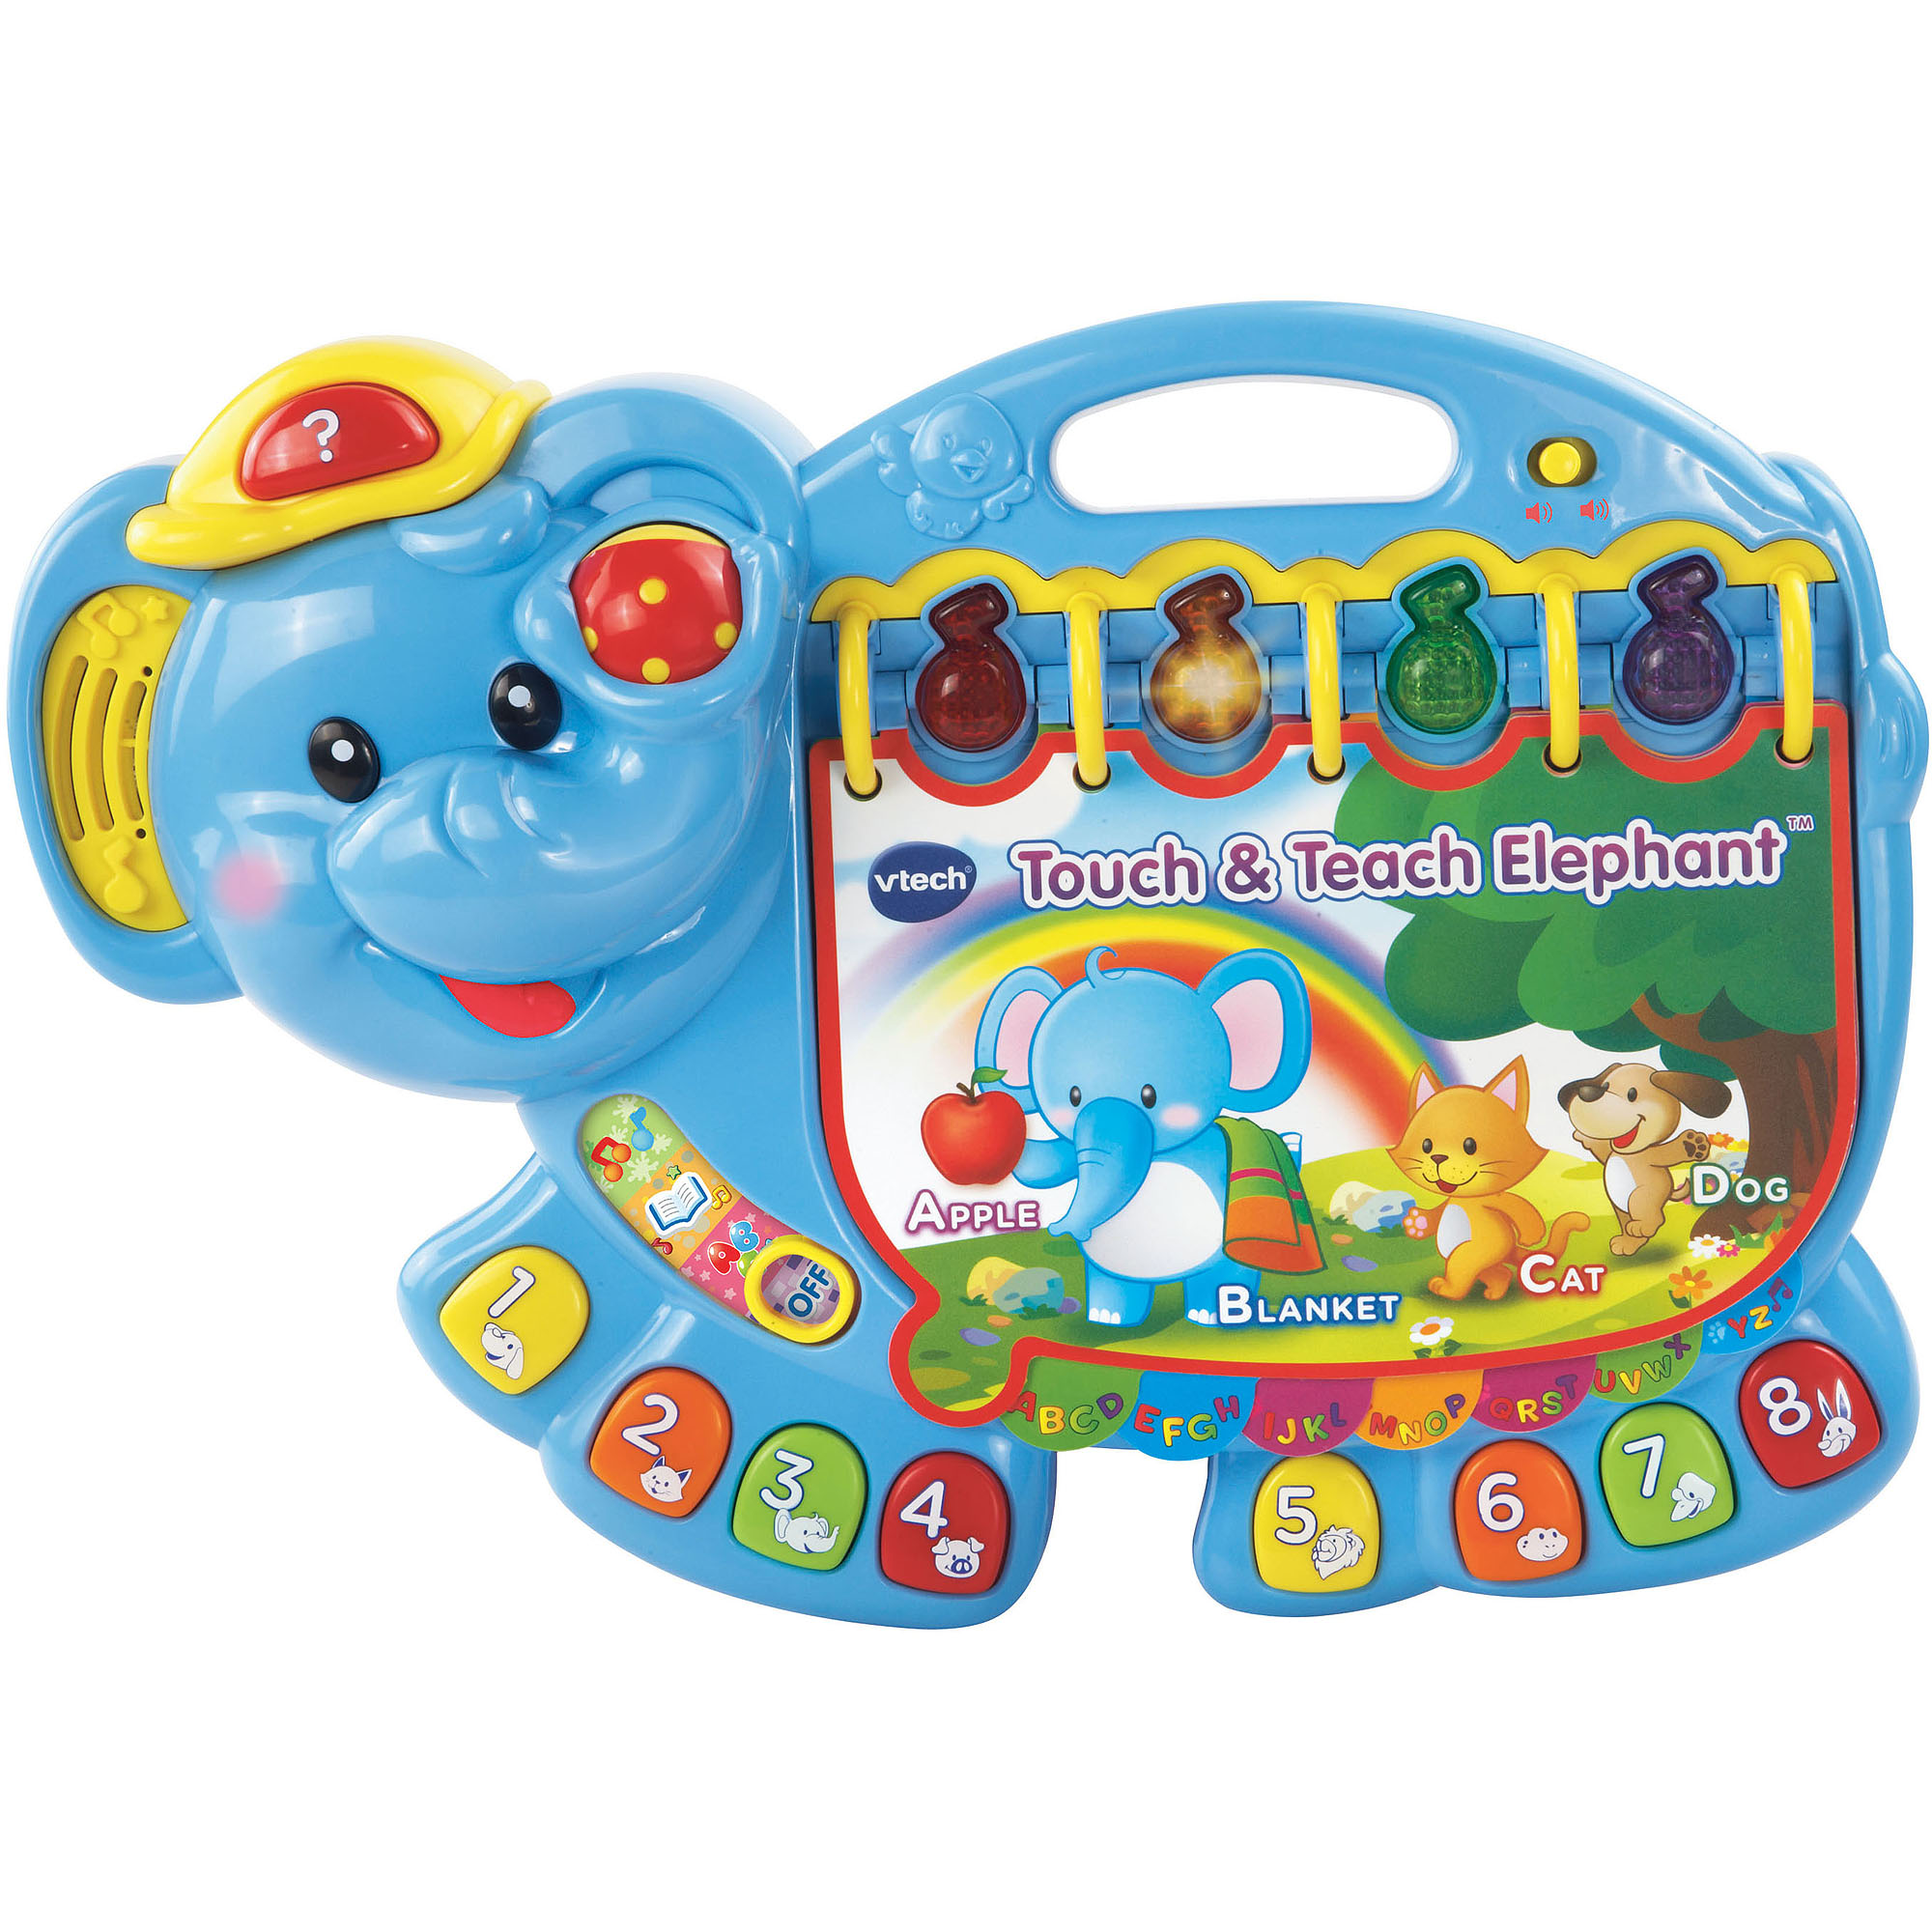 VTech Winnie the Pooh Play & Learn Phone Walmart